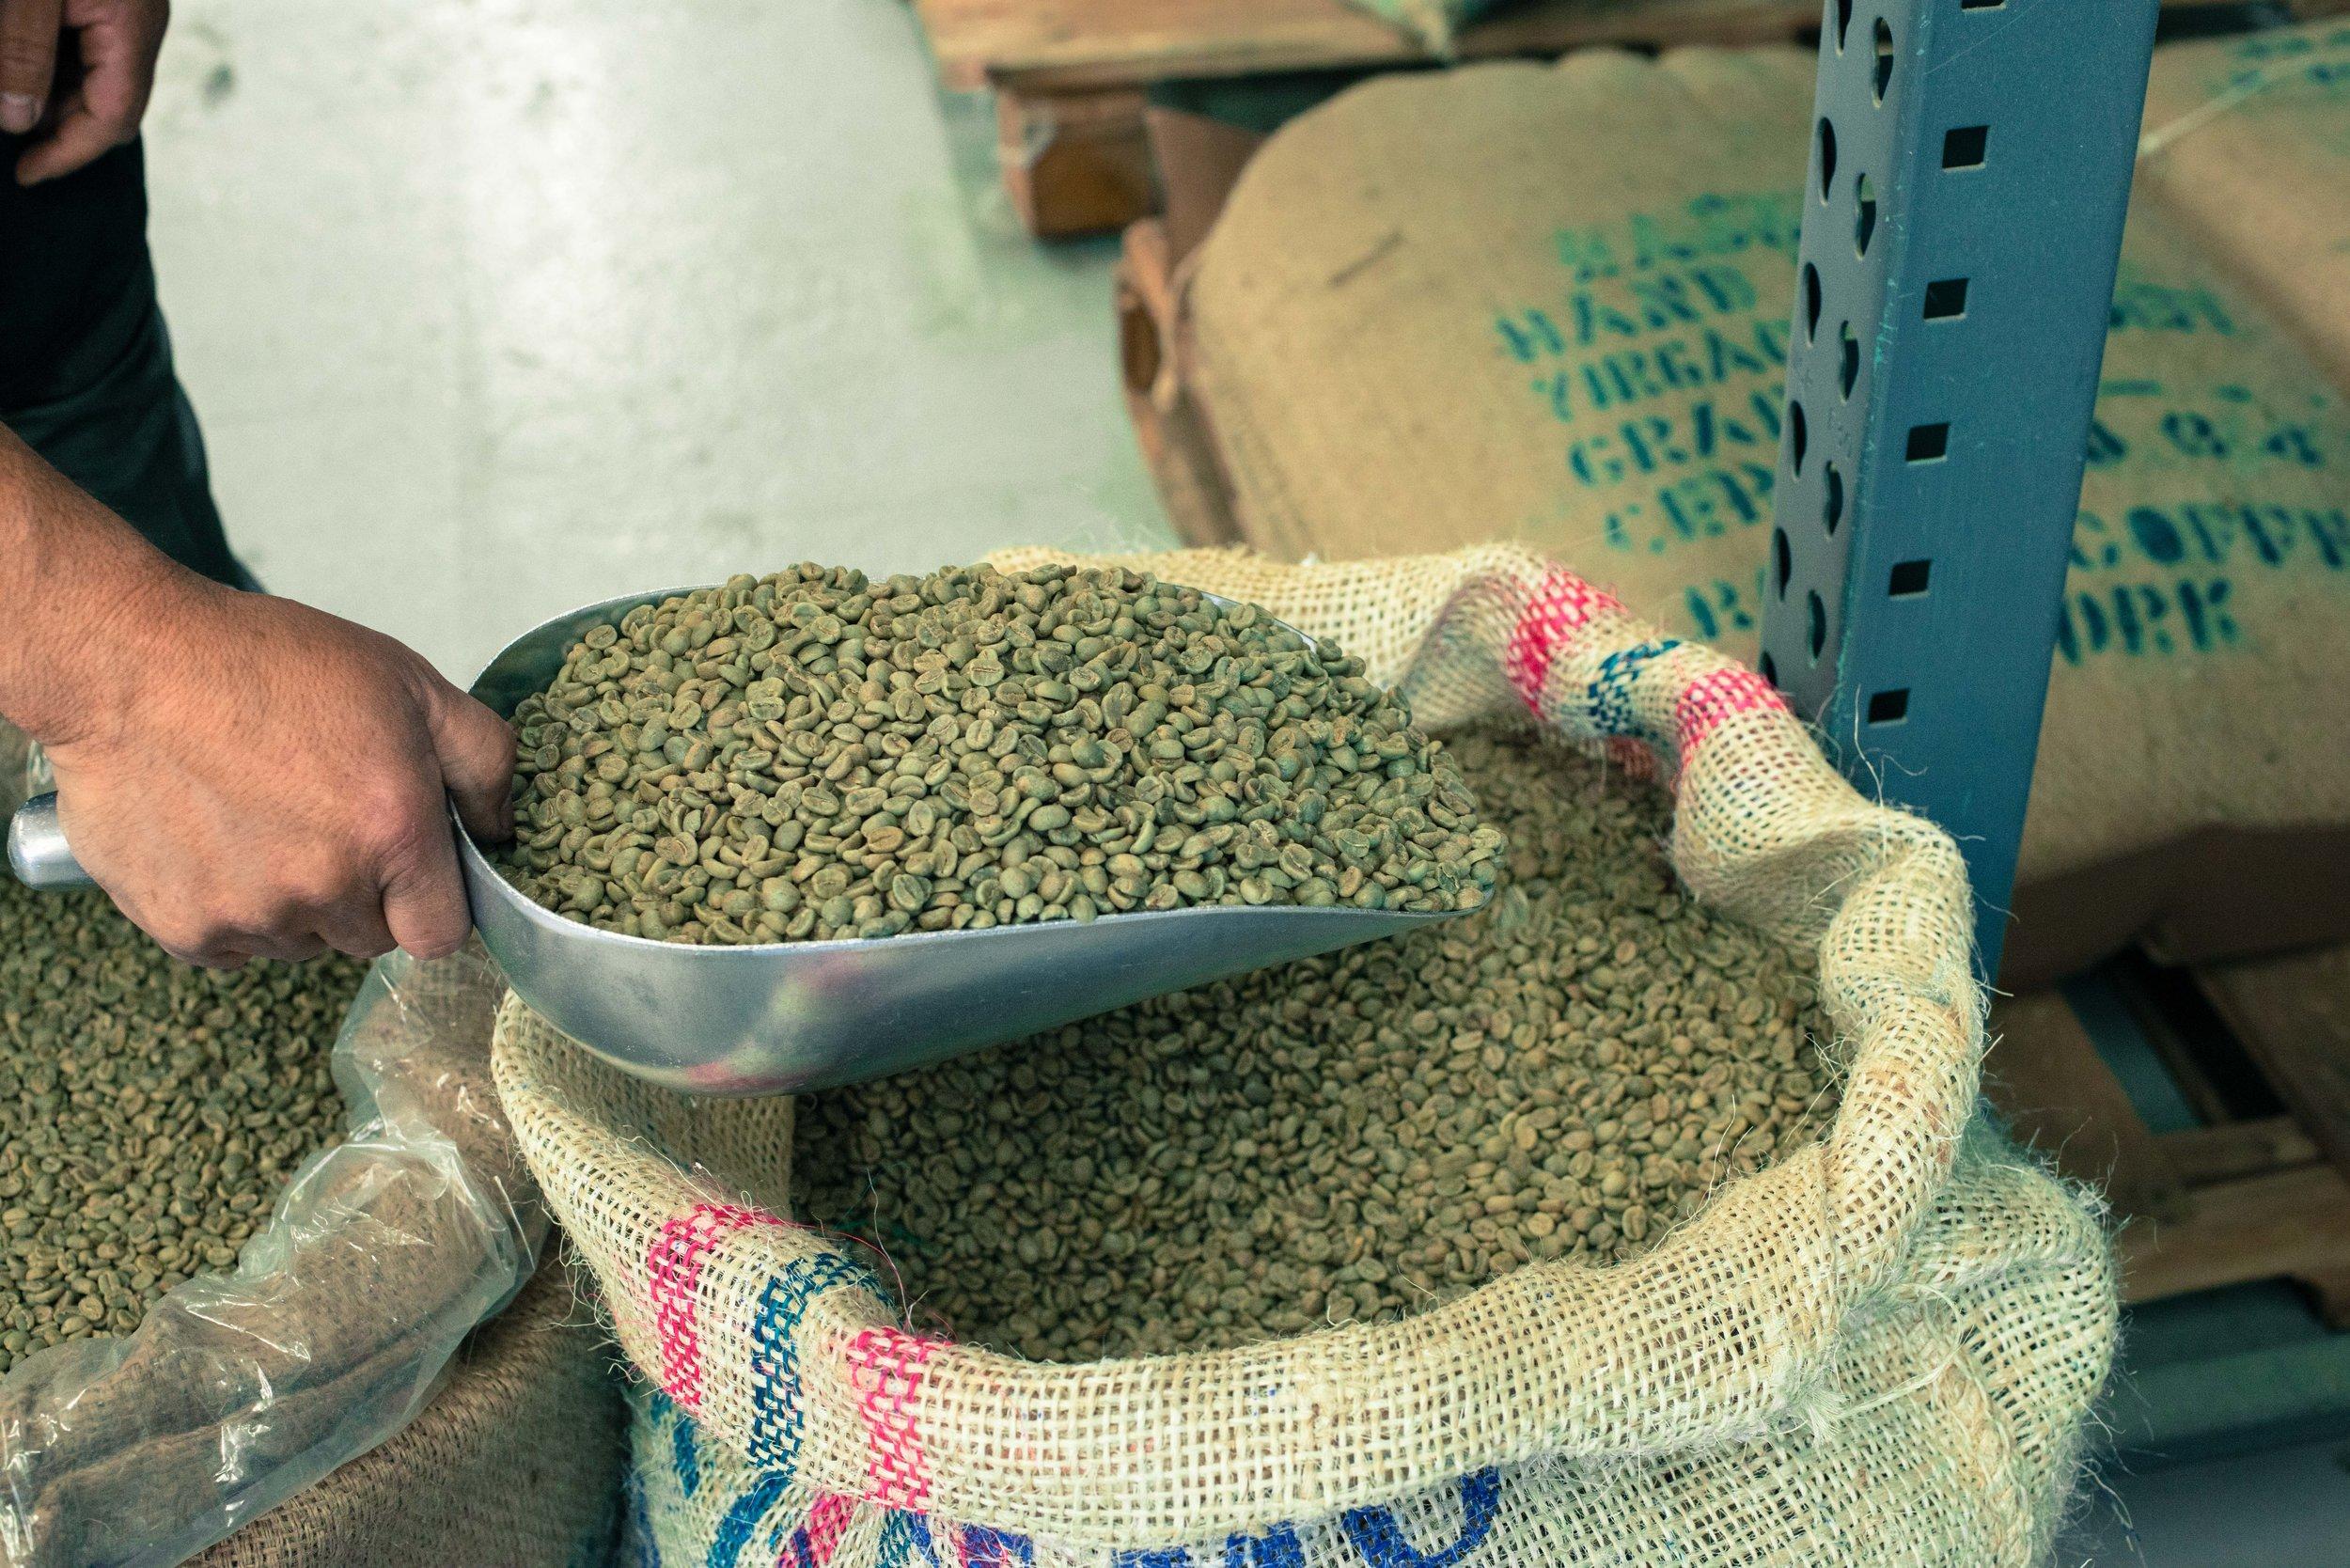 Green coffee beans before roasting.